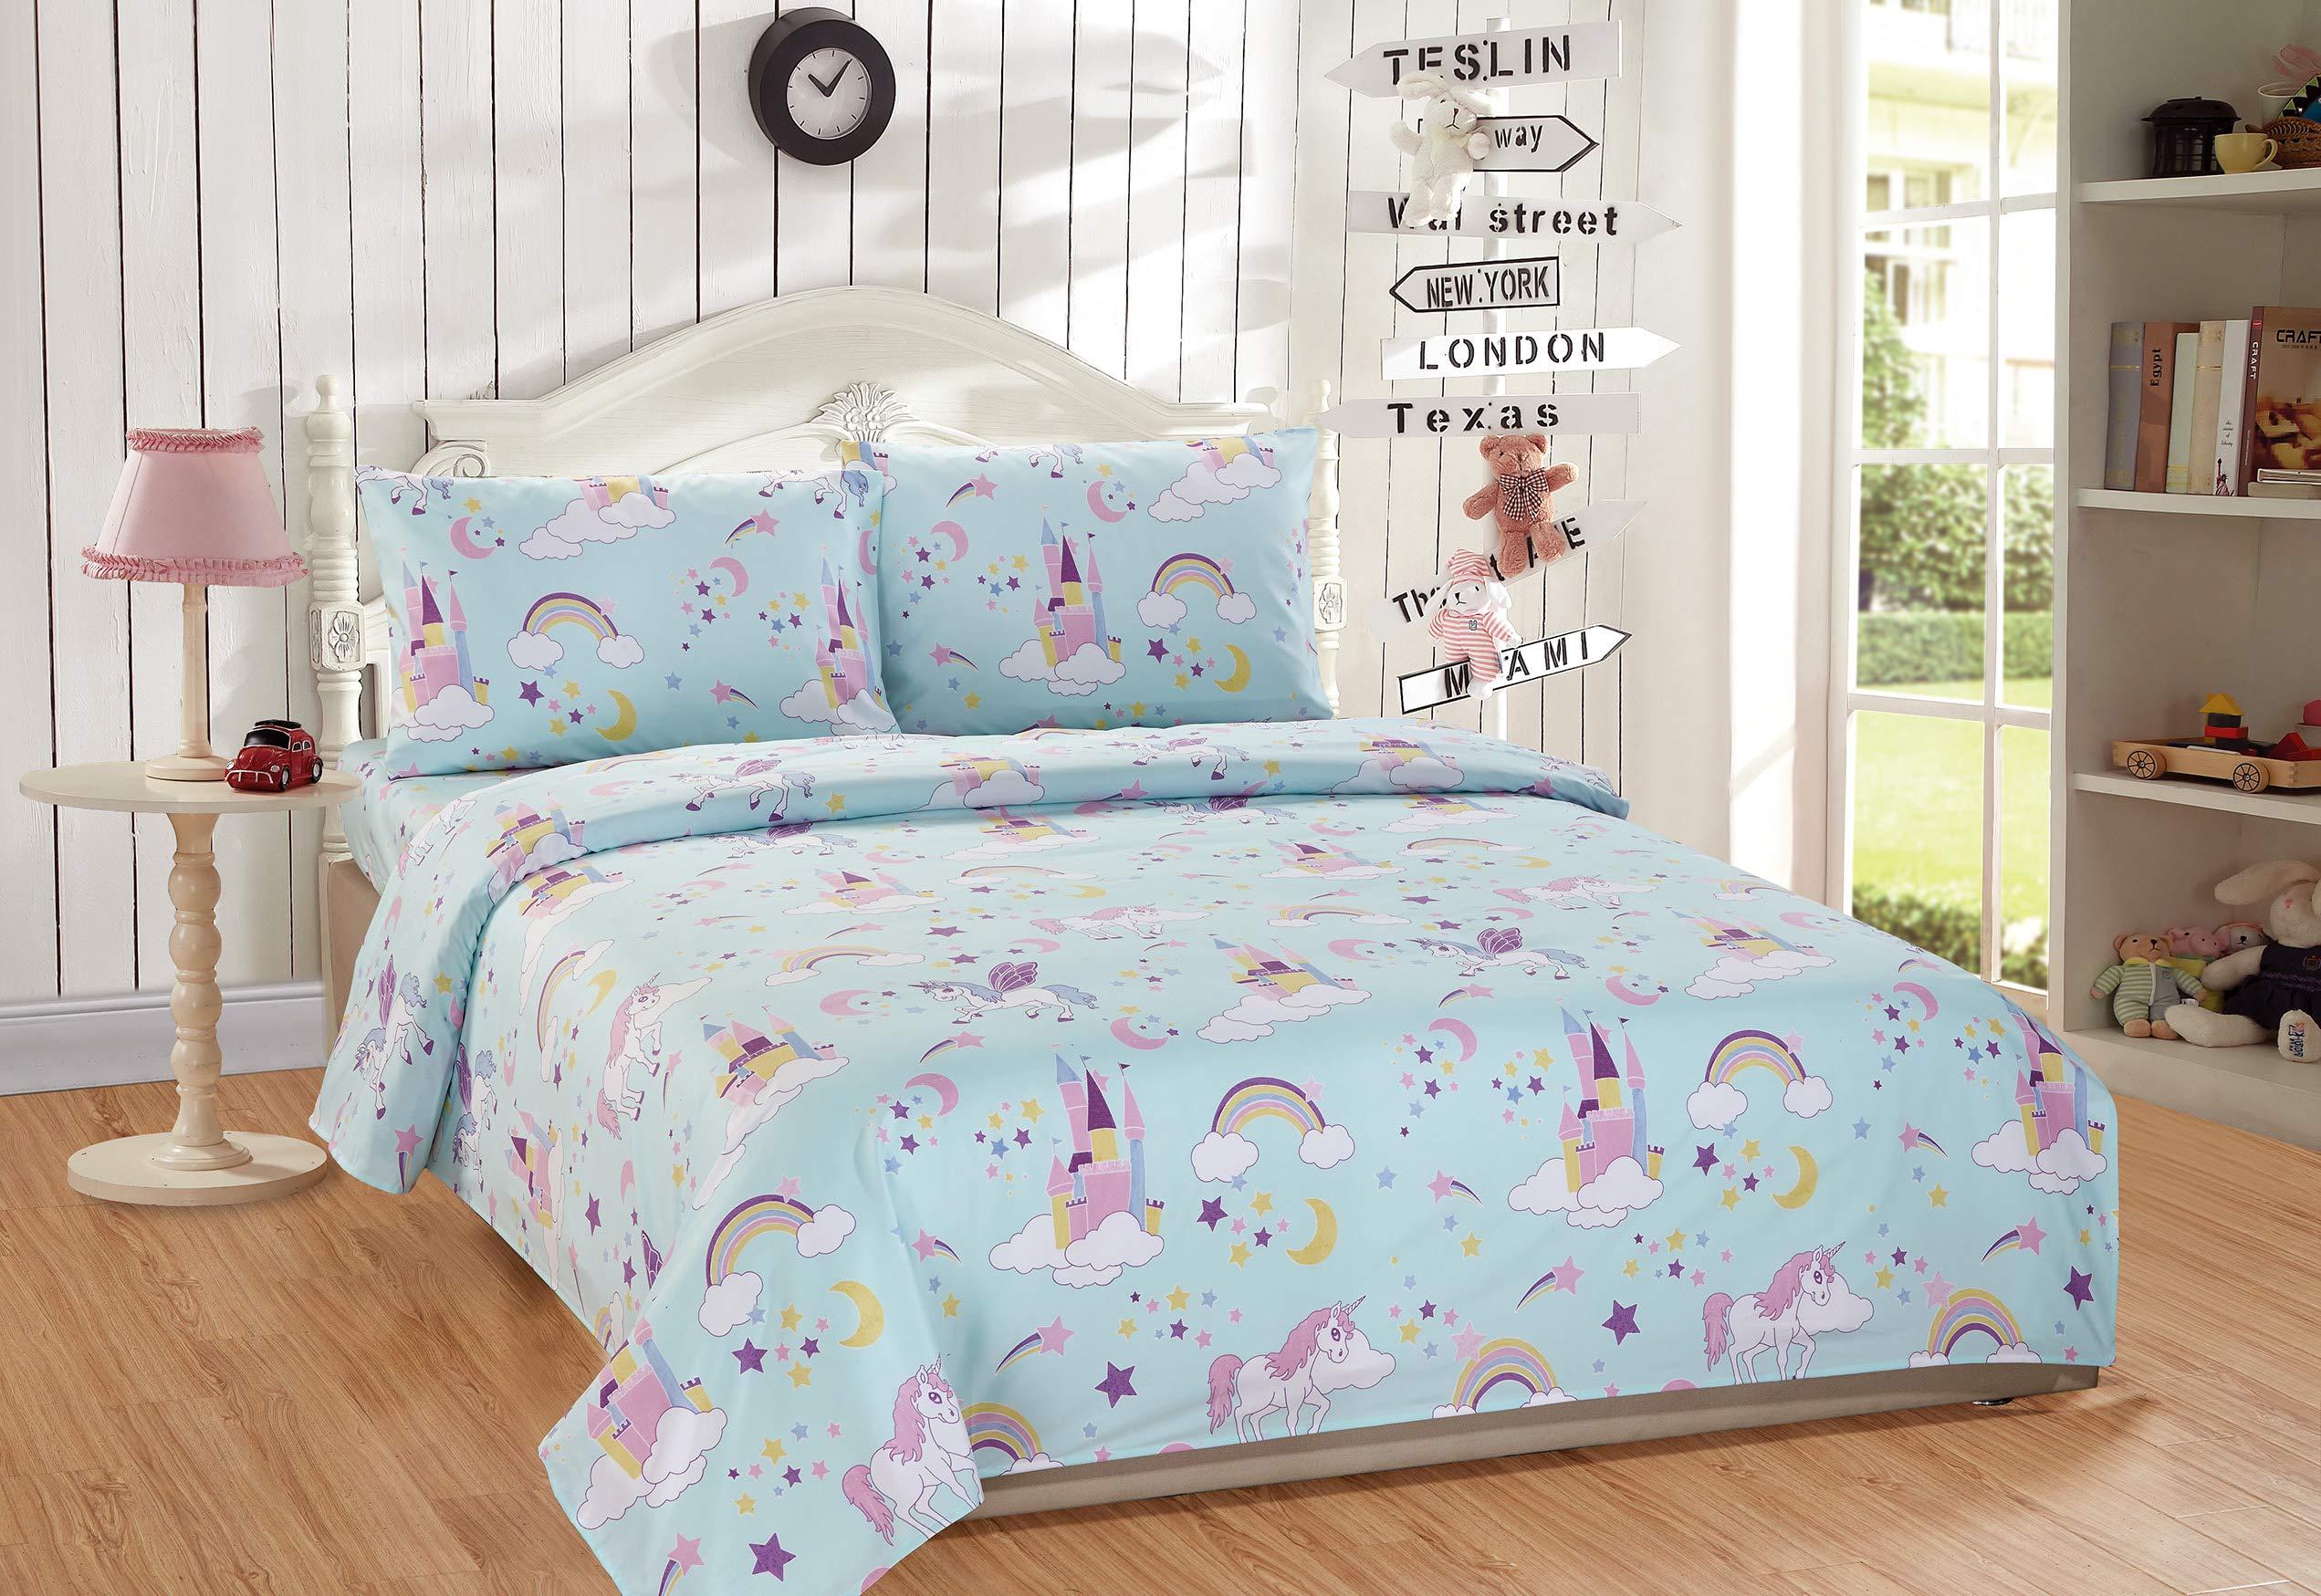 Linen Plus Full Size 4pc Sheet Set for Girls/Teens Unicorn Rainbow Castle Blue Purple Yellow White New by Linen Plus